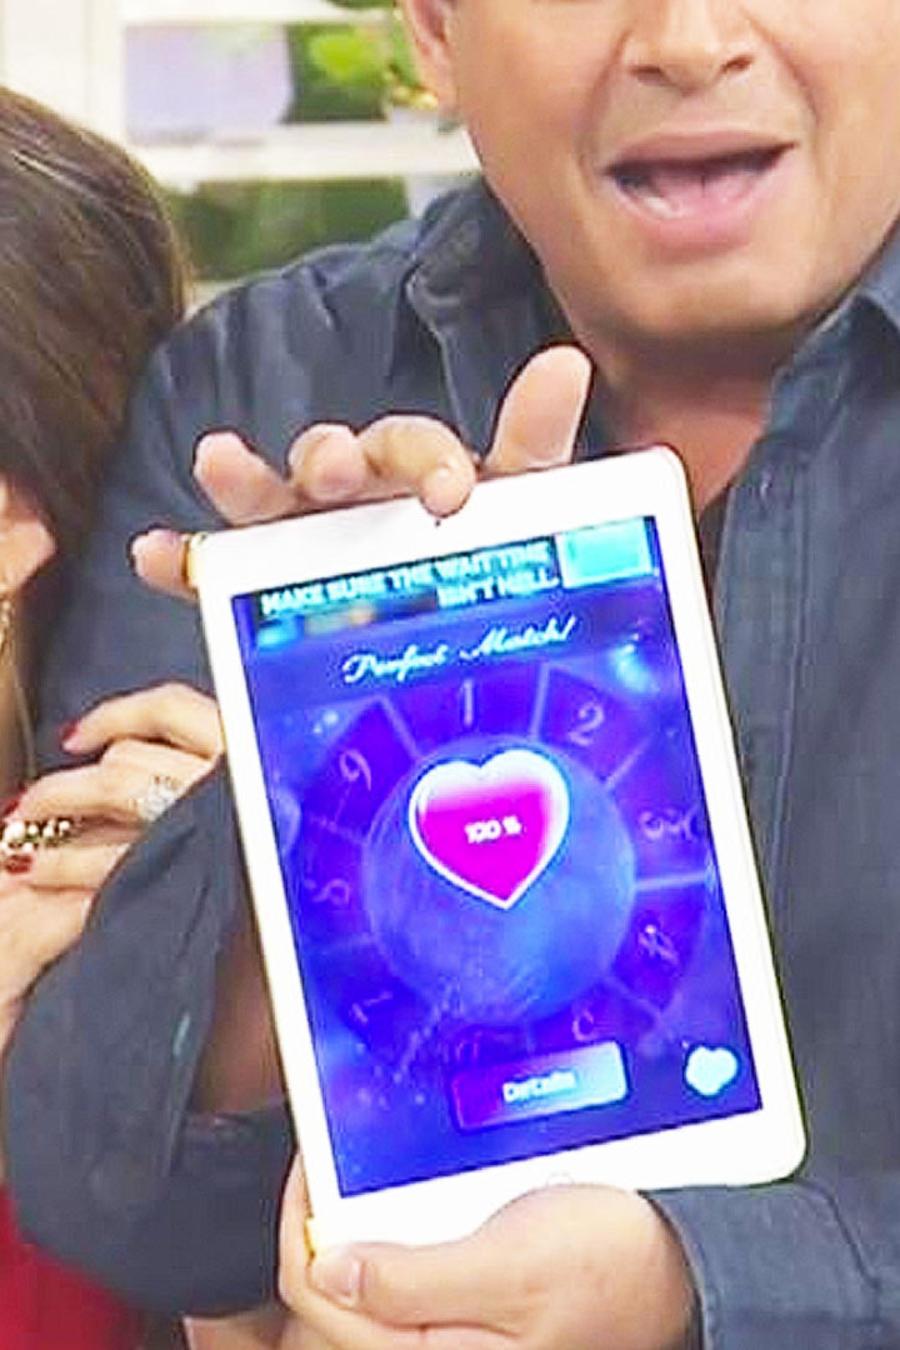 app compatibilidad amorosa